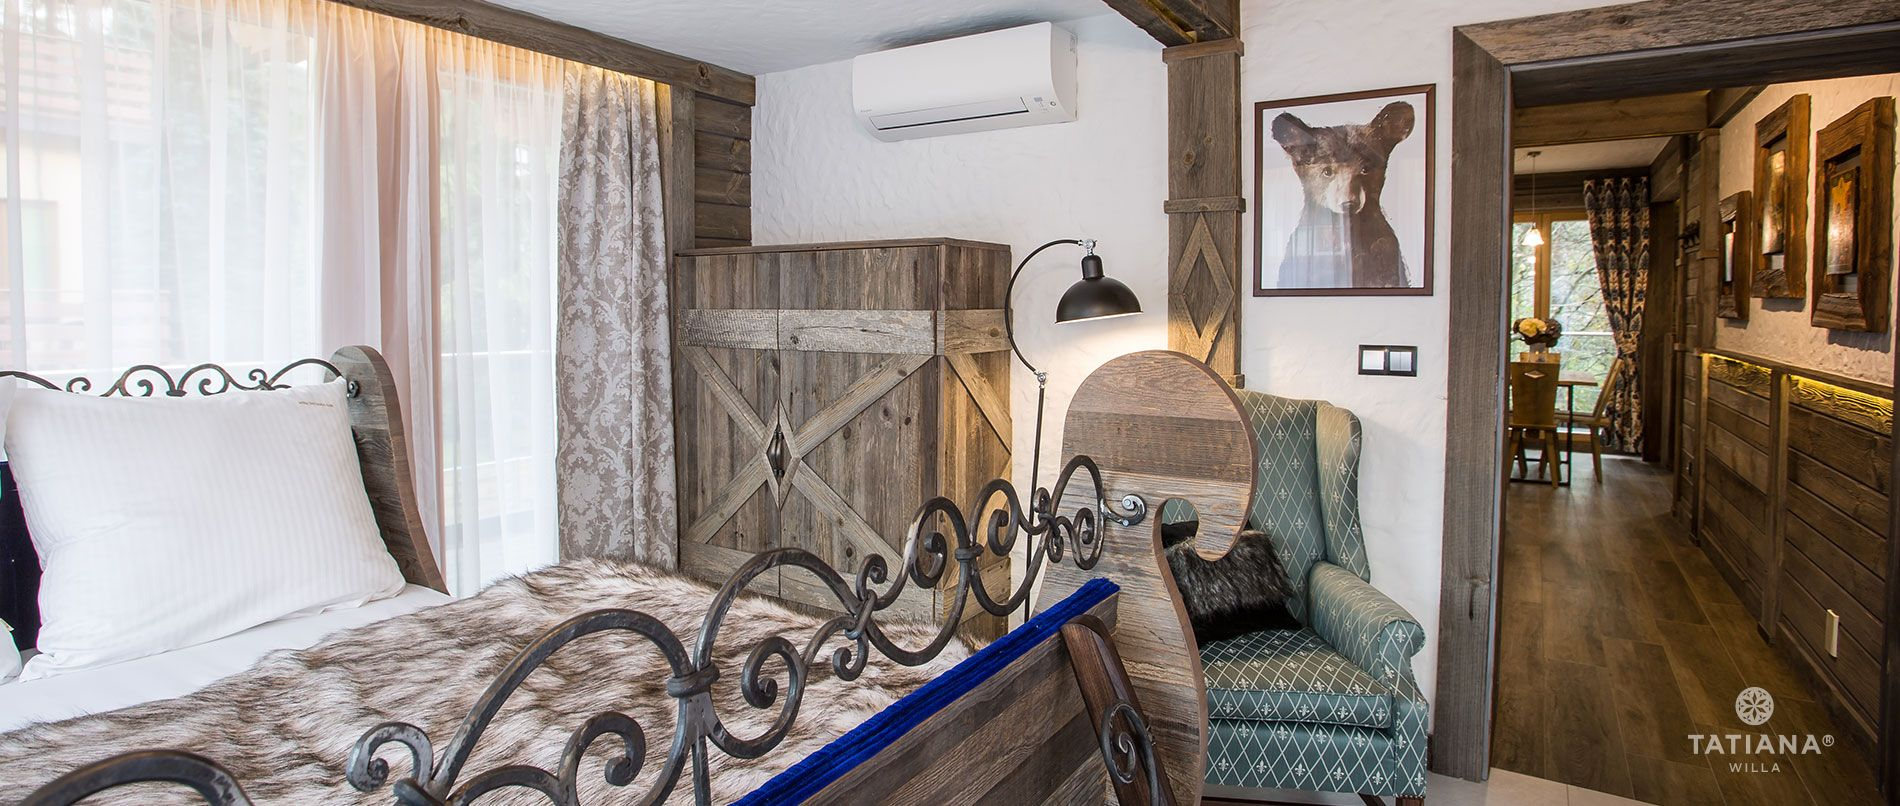 Apartament Syberyjski - sypialnia